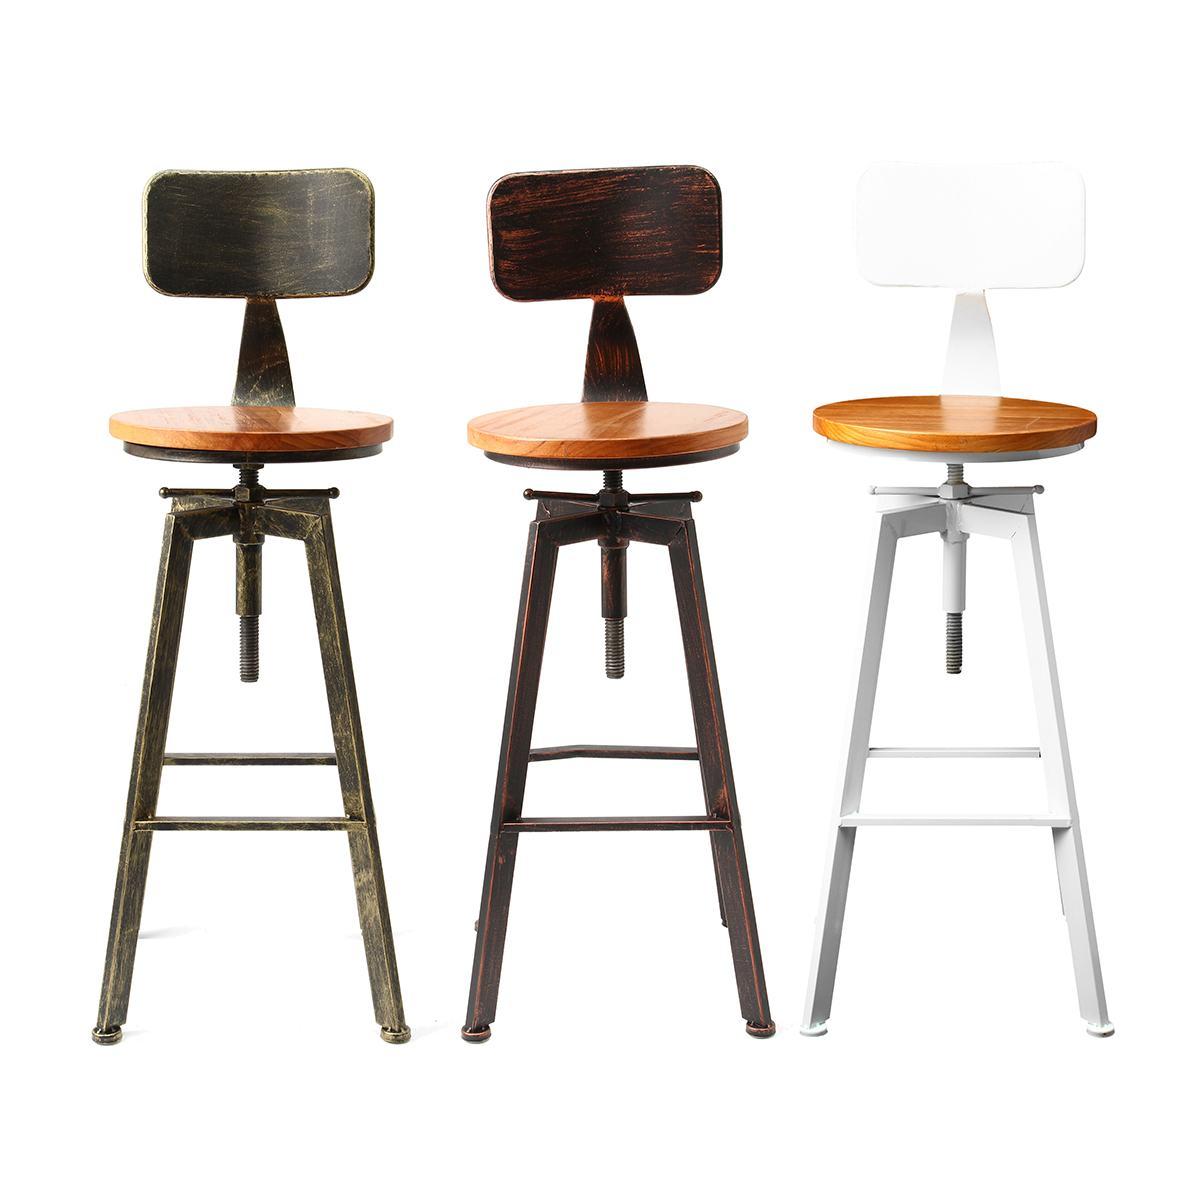 Furniture Bar Furniture Banqueta Bancos Moderno Sandalyesi Cadir Industriel Table Stoelen Barkrukken Tabouret De Moderne Stool Modern Silla Bar Chair To Have A Unique National Style